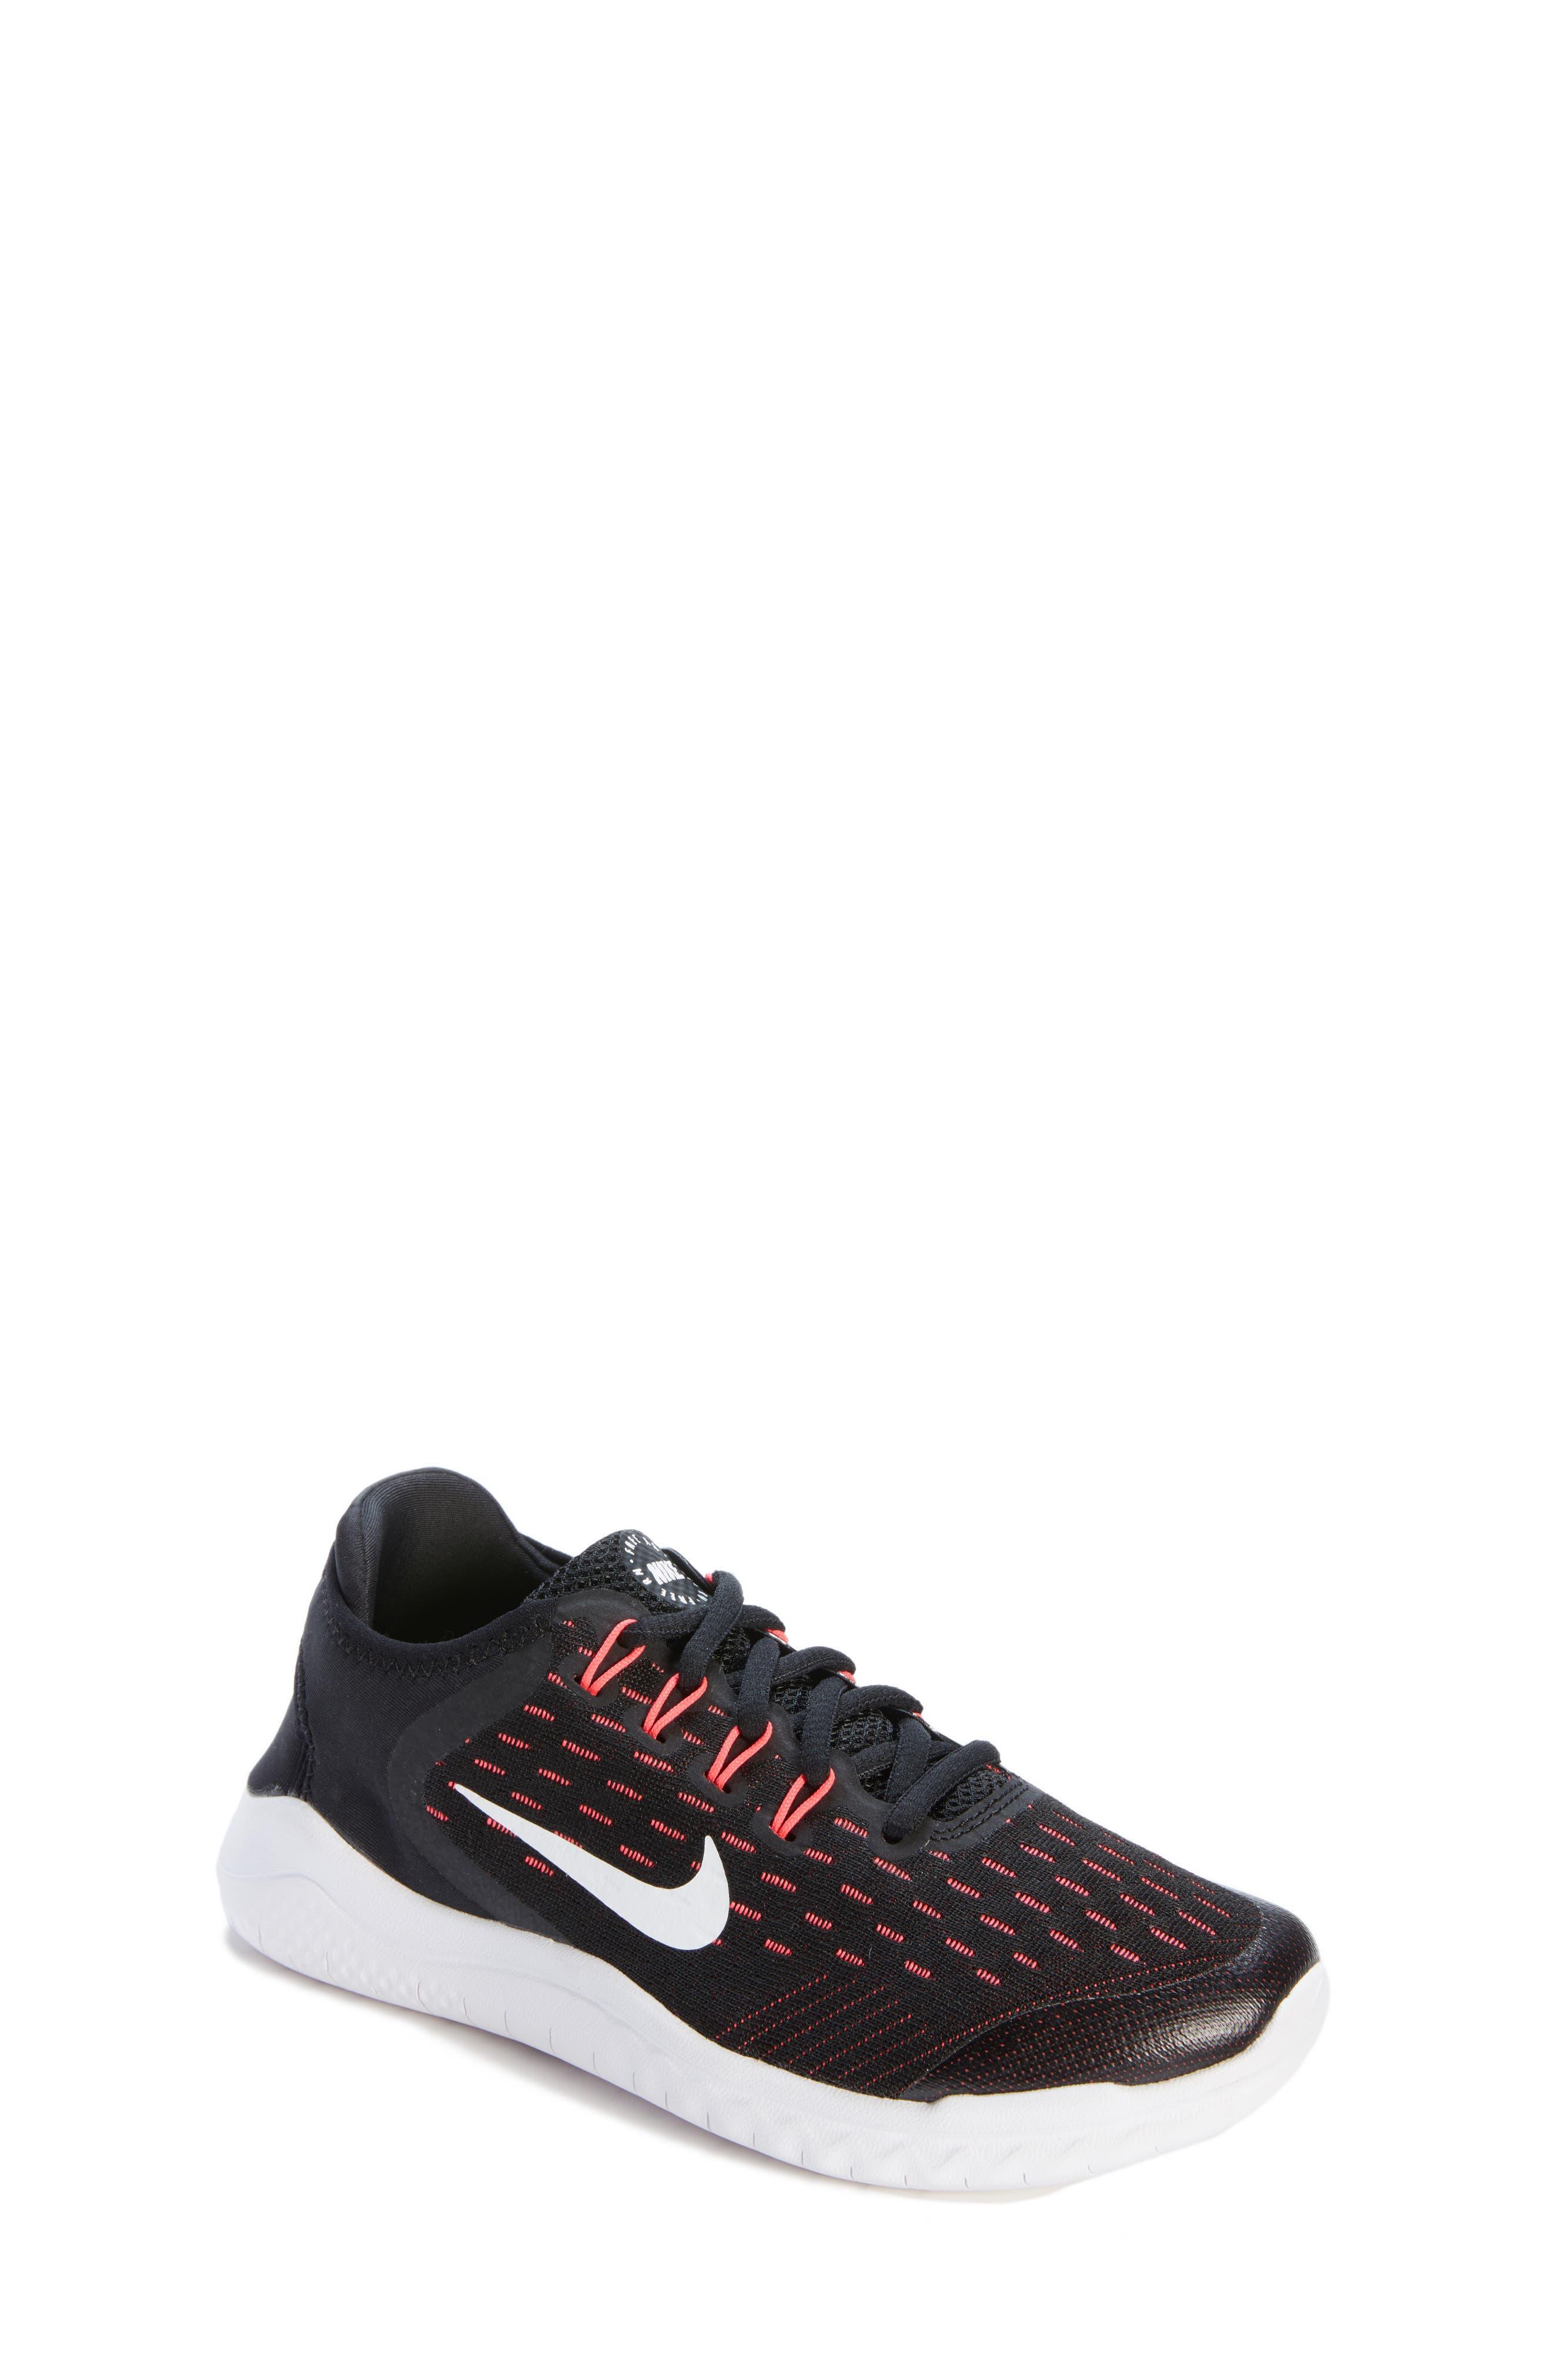 Free RN 2018 Running Shoe,                         Main,                         color, Black/ White/ Pink/ Volt